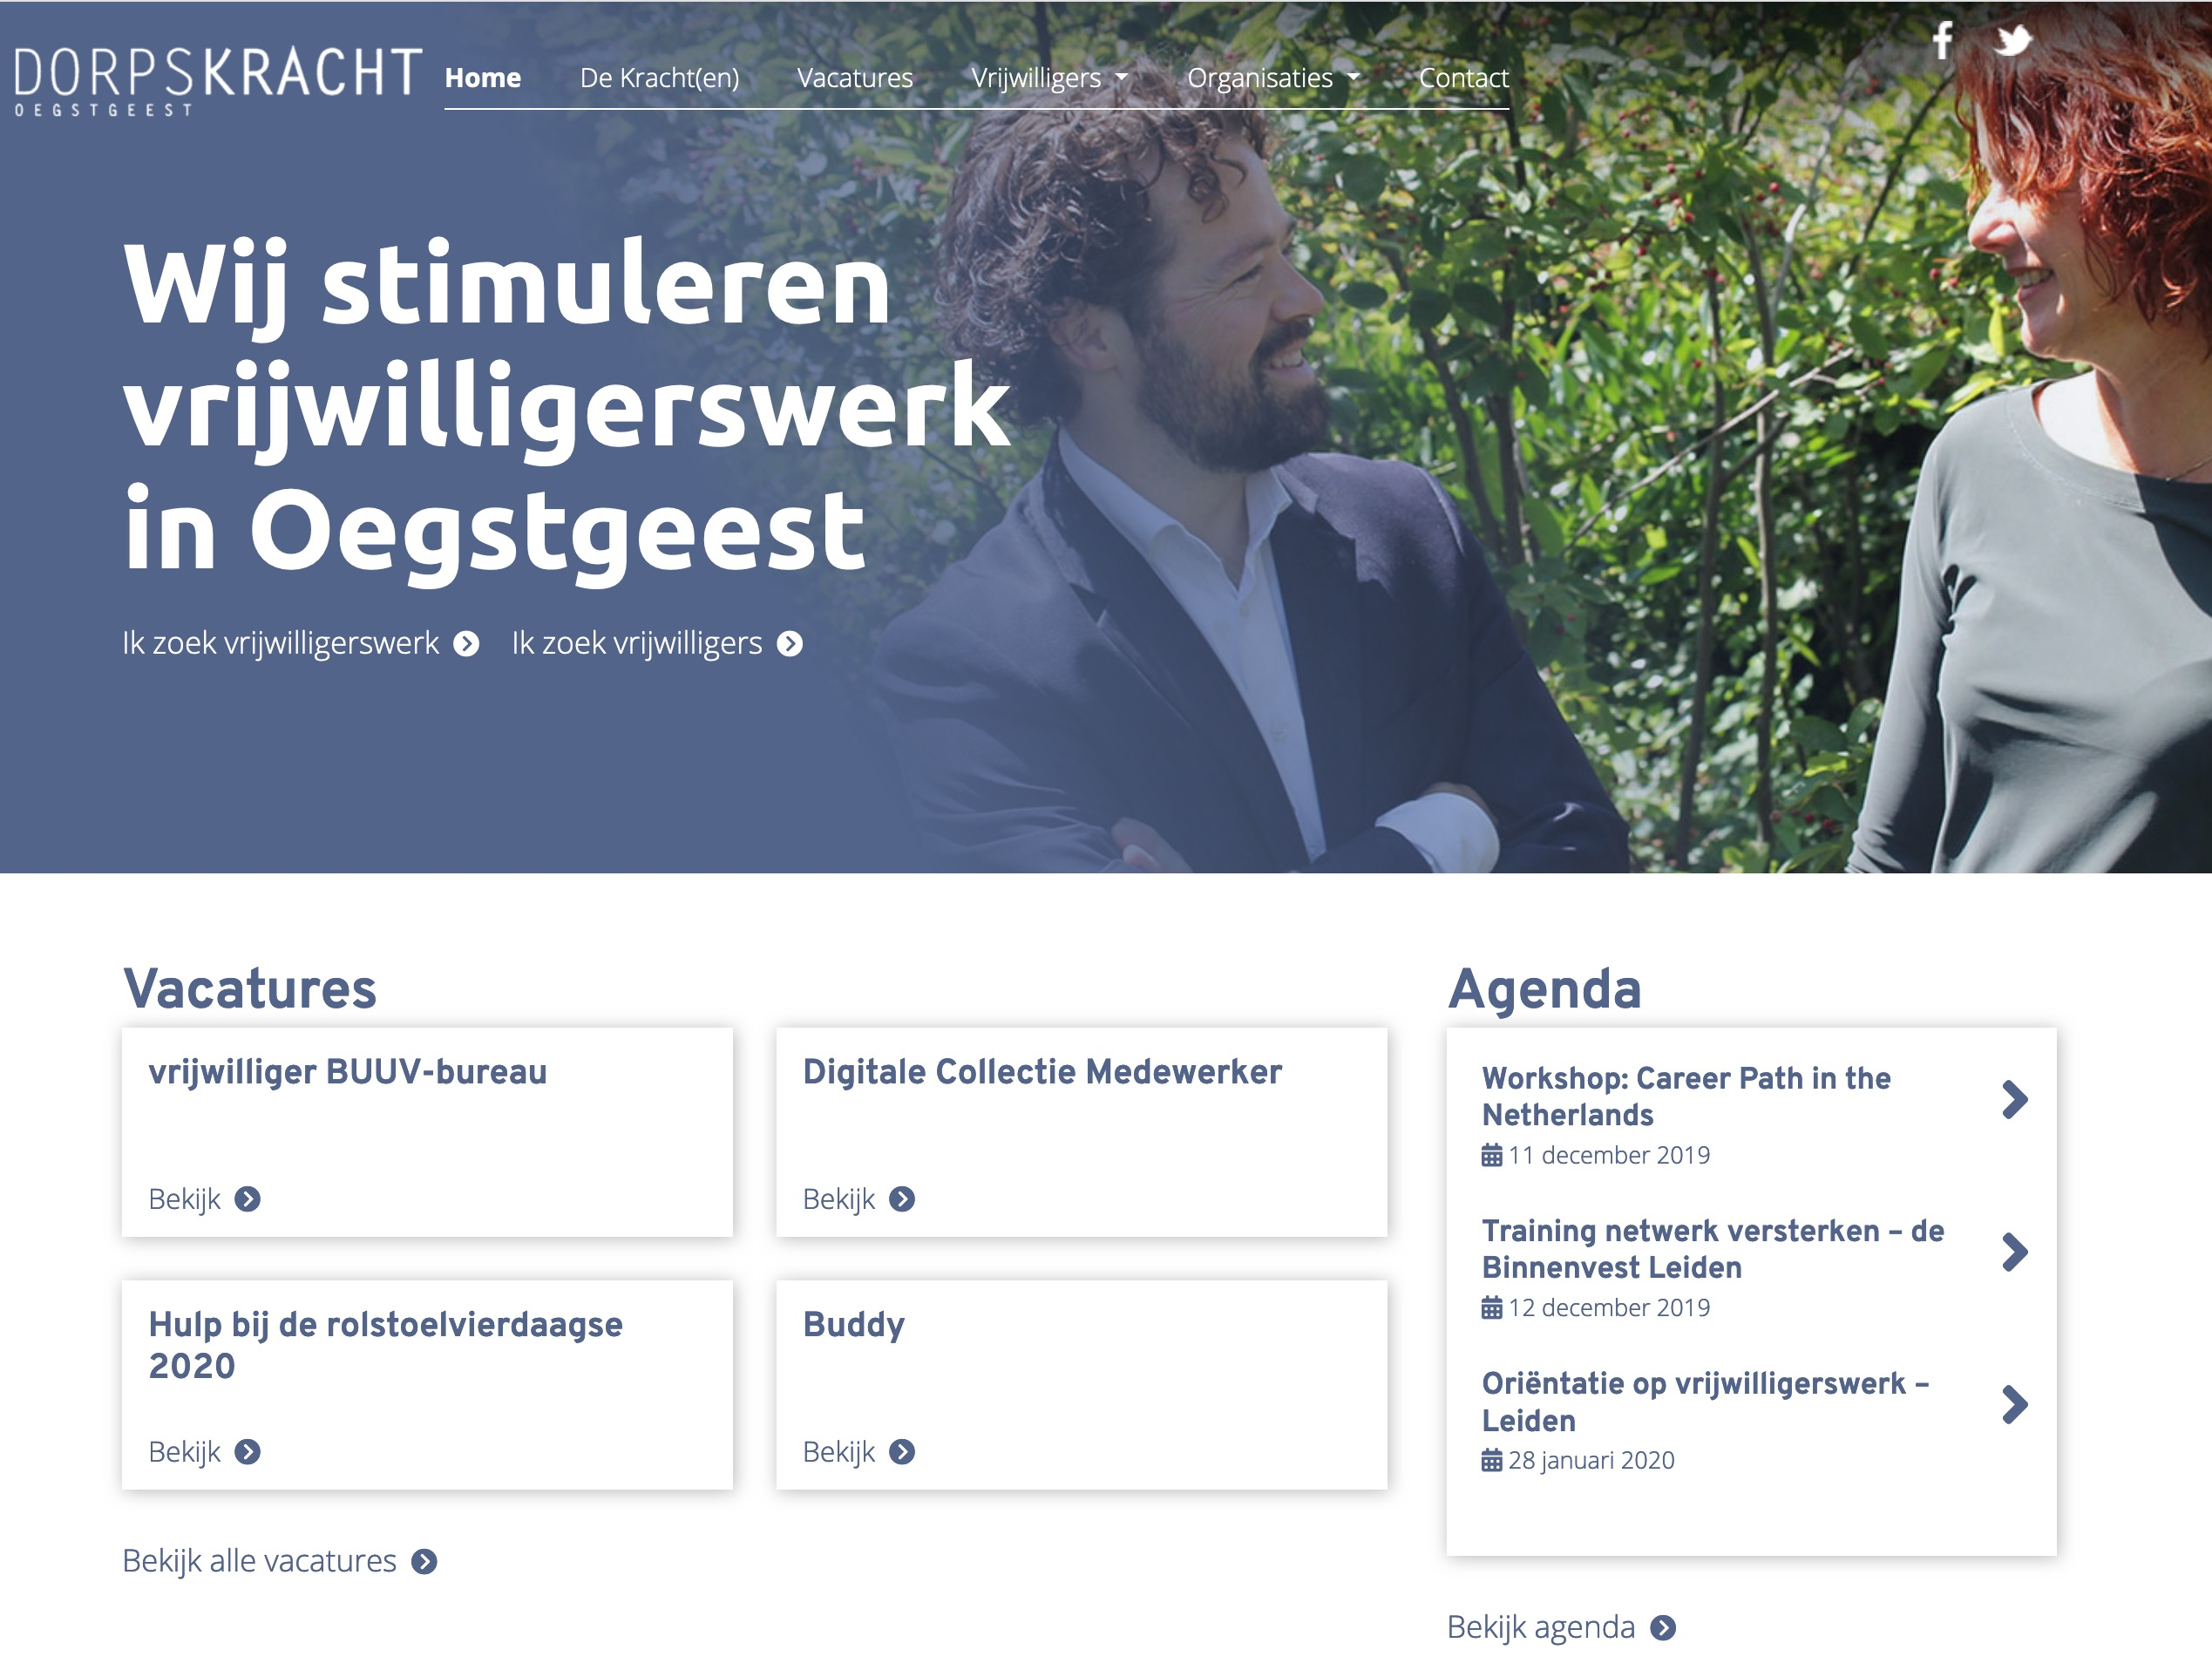 Dorpskracht.nl